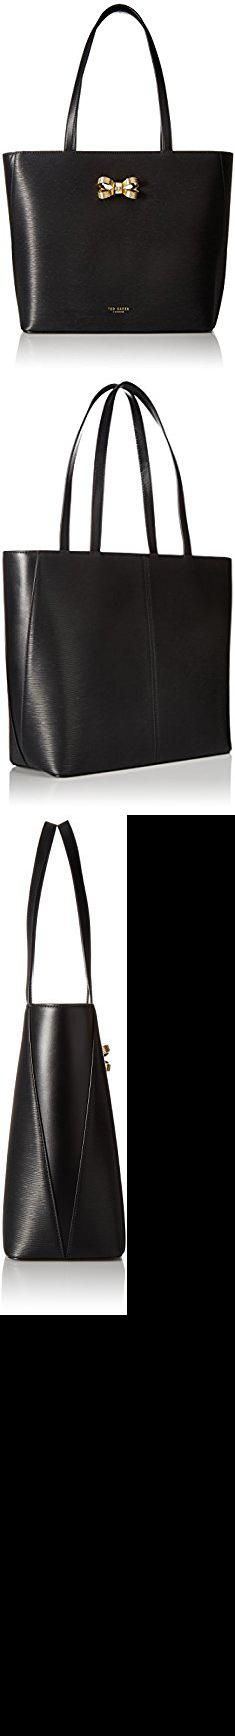 Ted Baker Leather Shopper Bag. Ted Baker Larah, Black.  #ted #baker #leather #shopper #bag #tedbaker #bakerleather #leathershopper